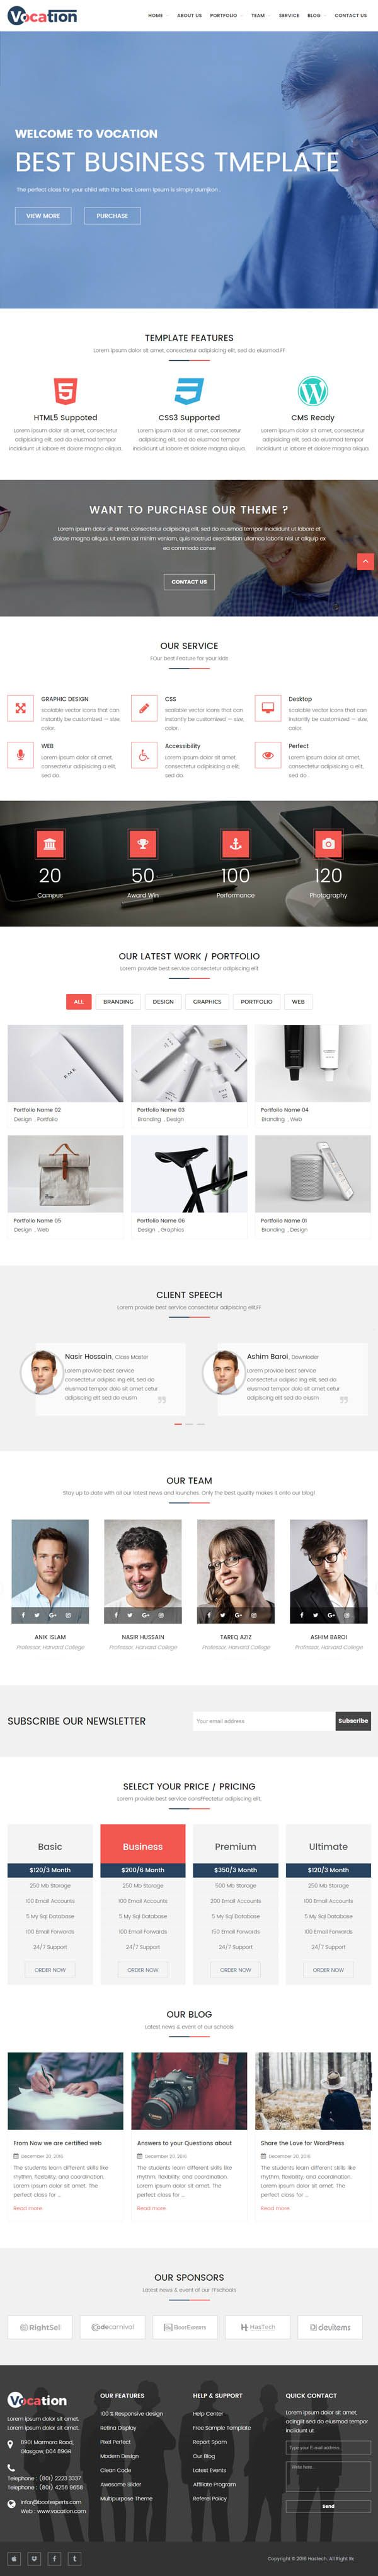 Vocation – Corporate WordPress Theme #blog #bootstrap #css3 #entrepreneurs #html5 #responsivedesign #seo #wordpressthemes